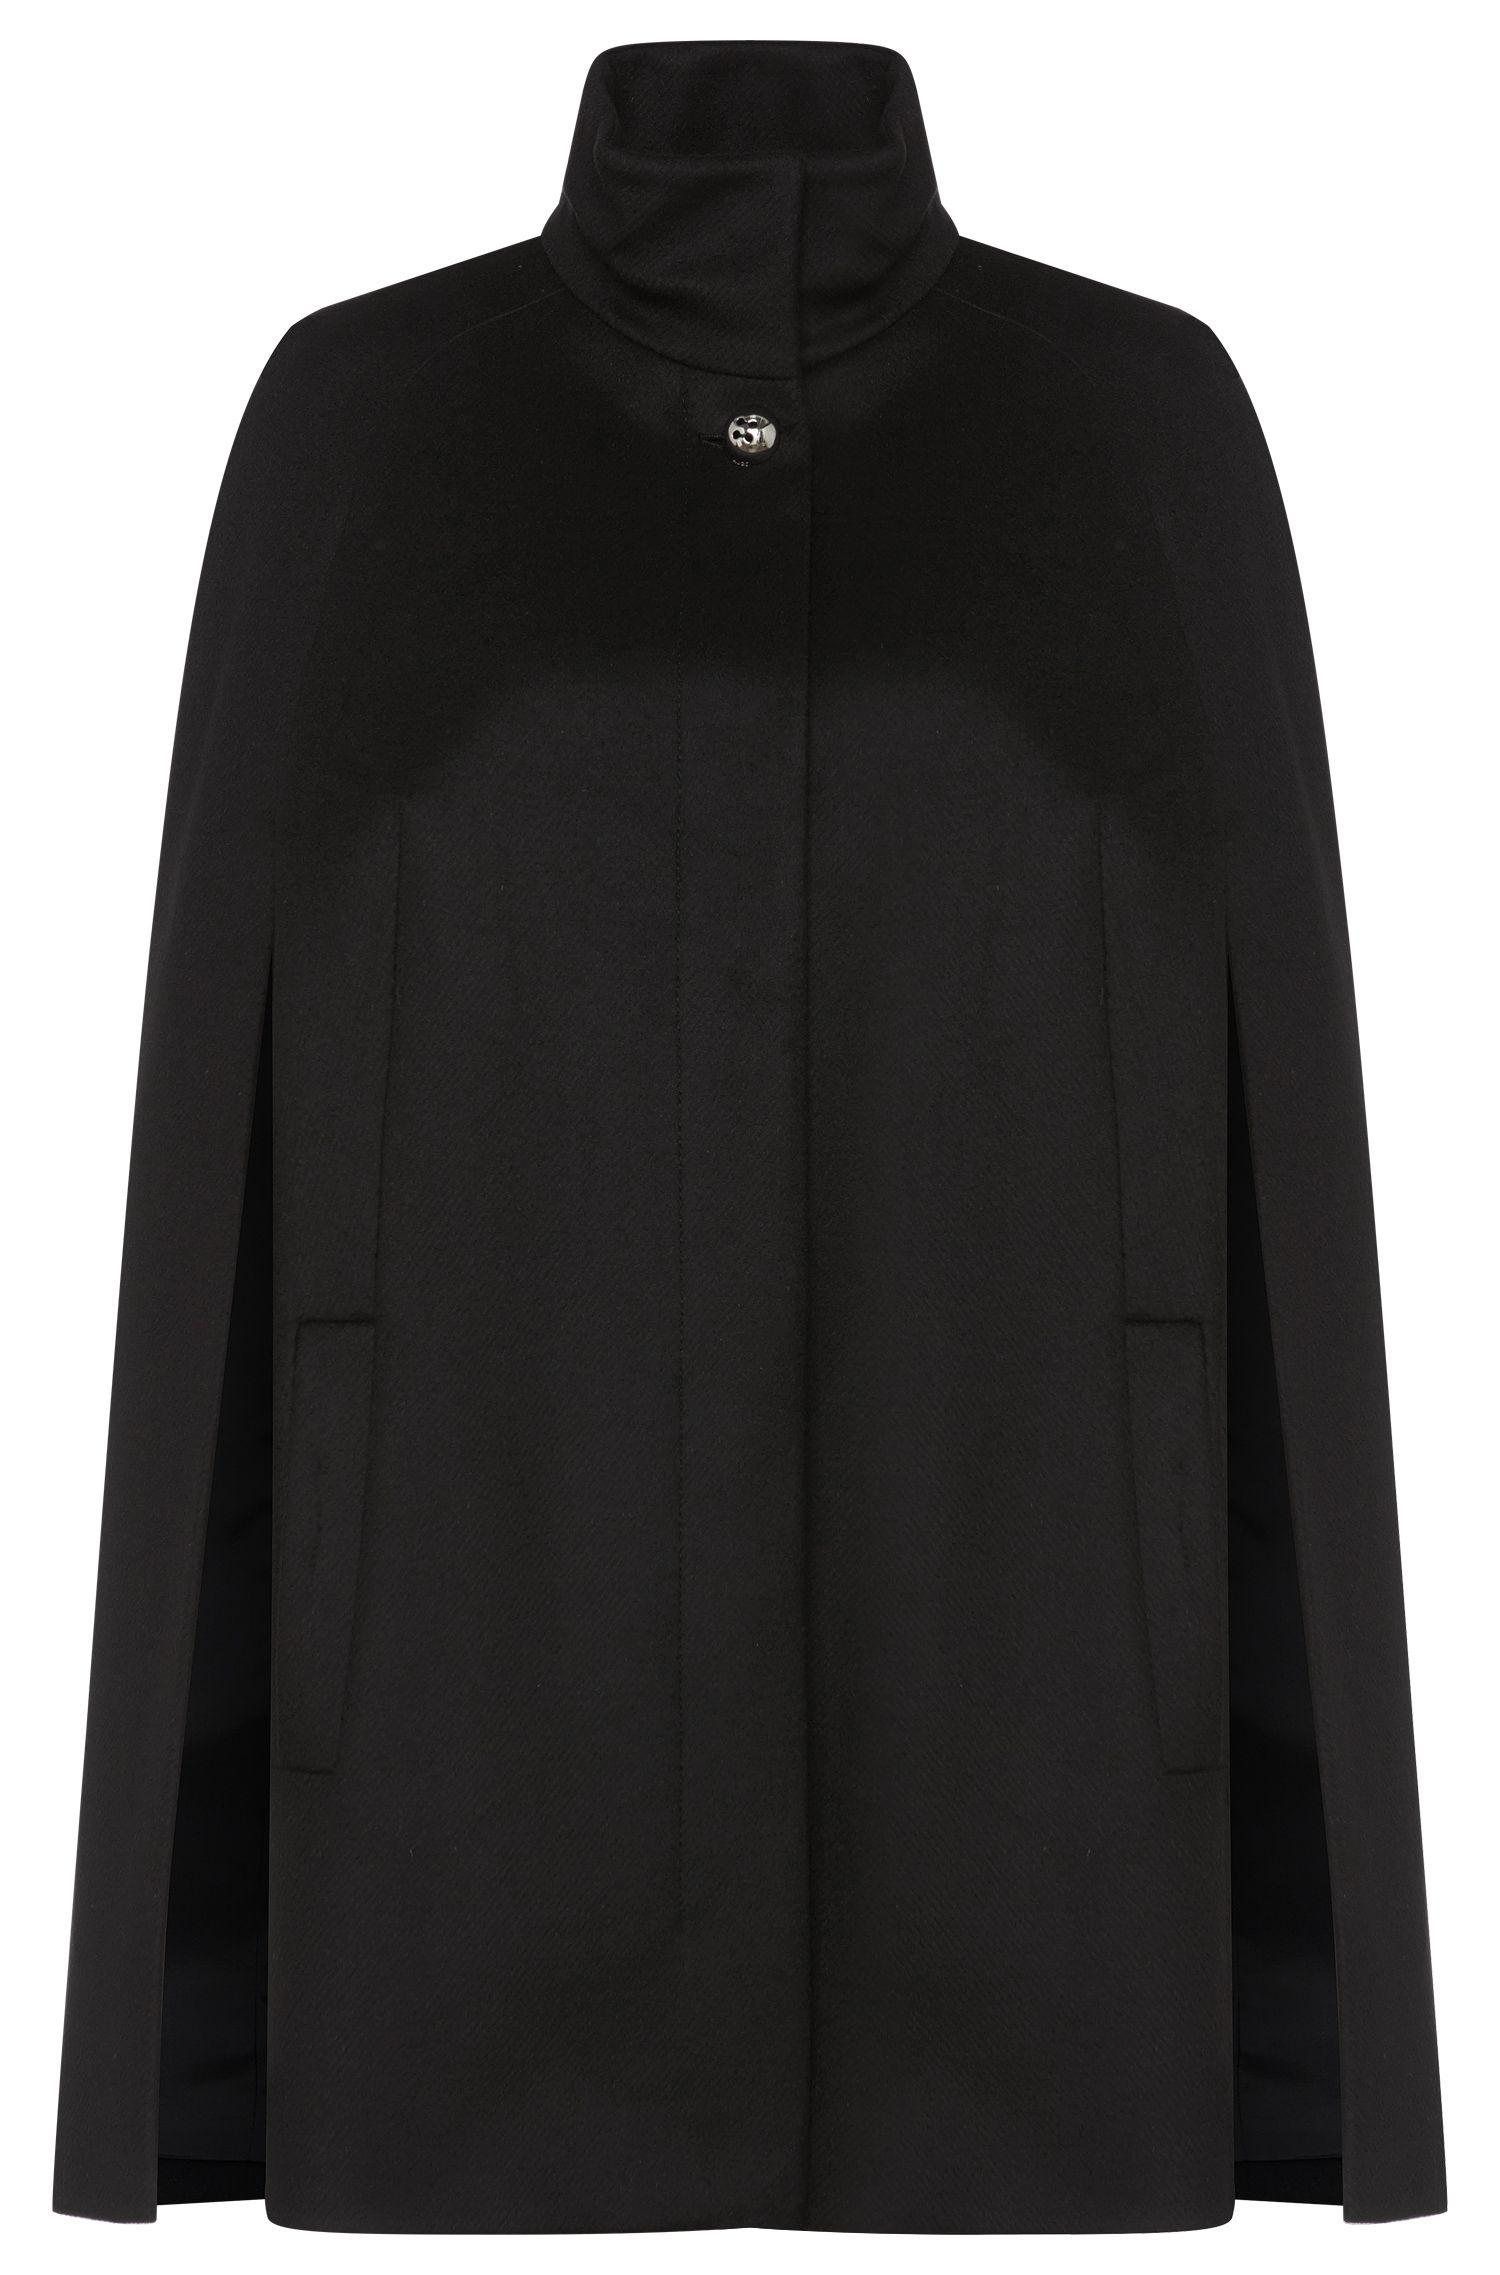 'Maita' | Virgin Wool Cashmere Twill Cape